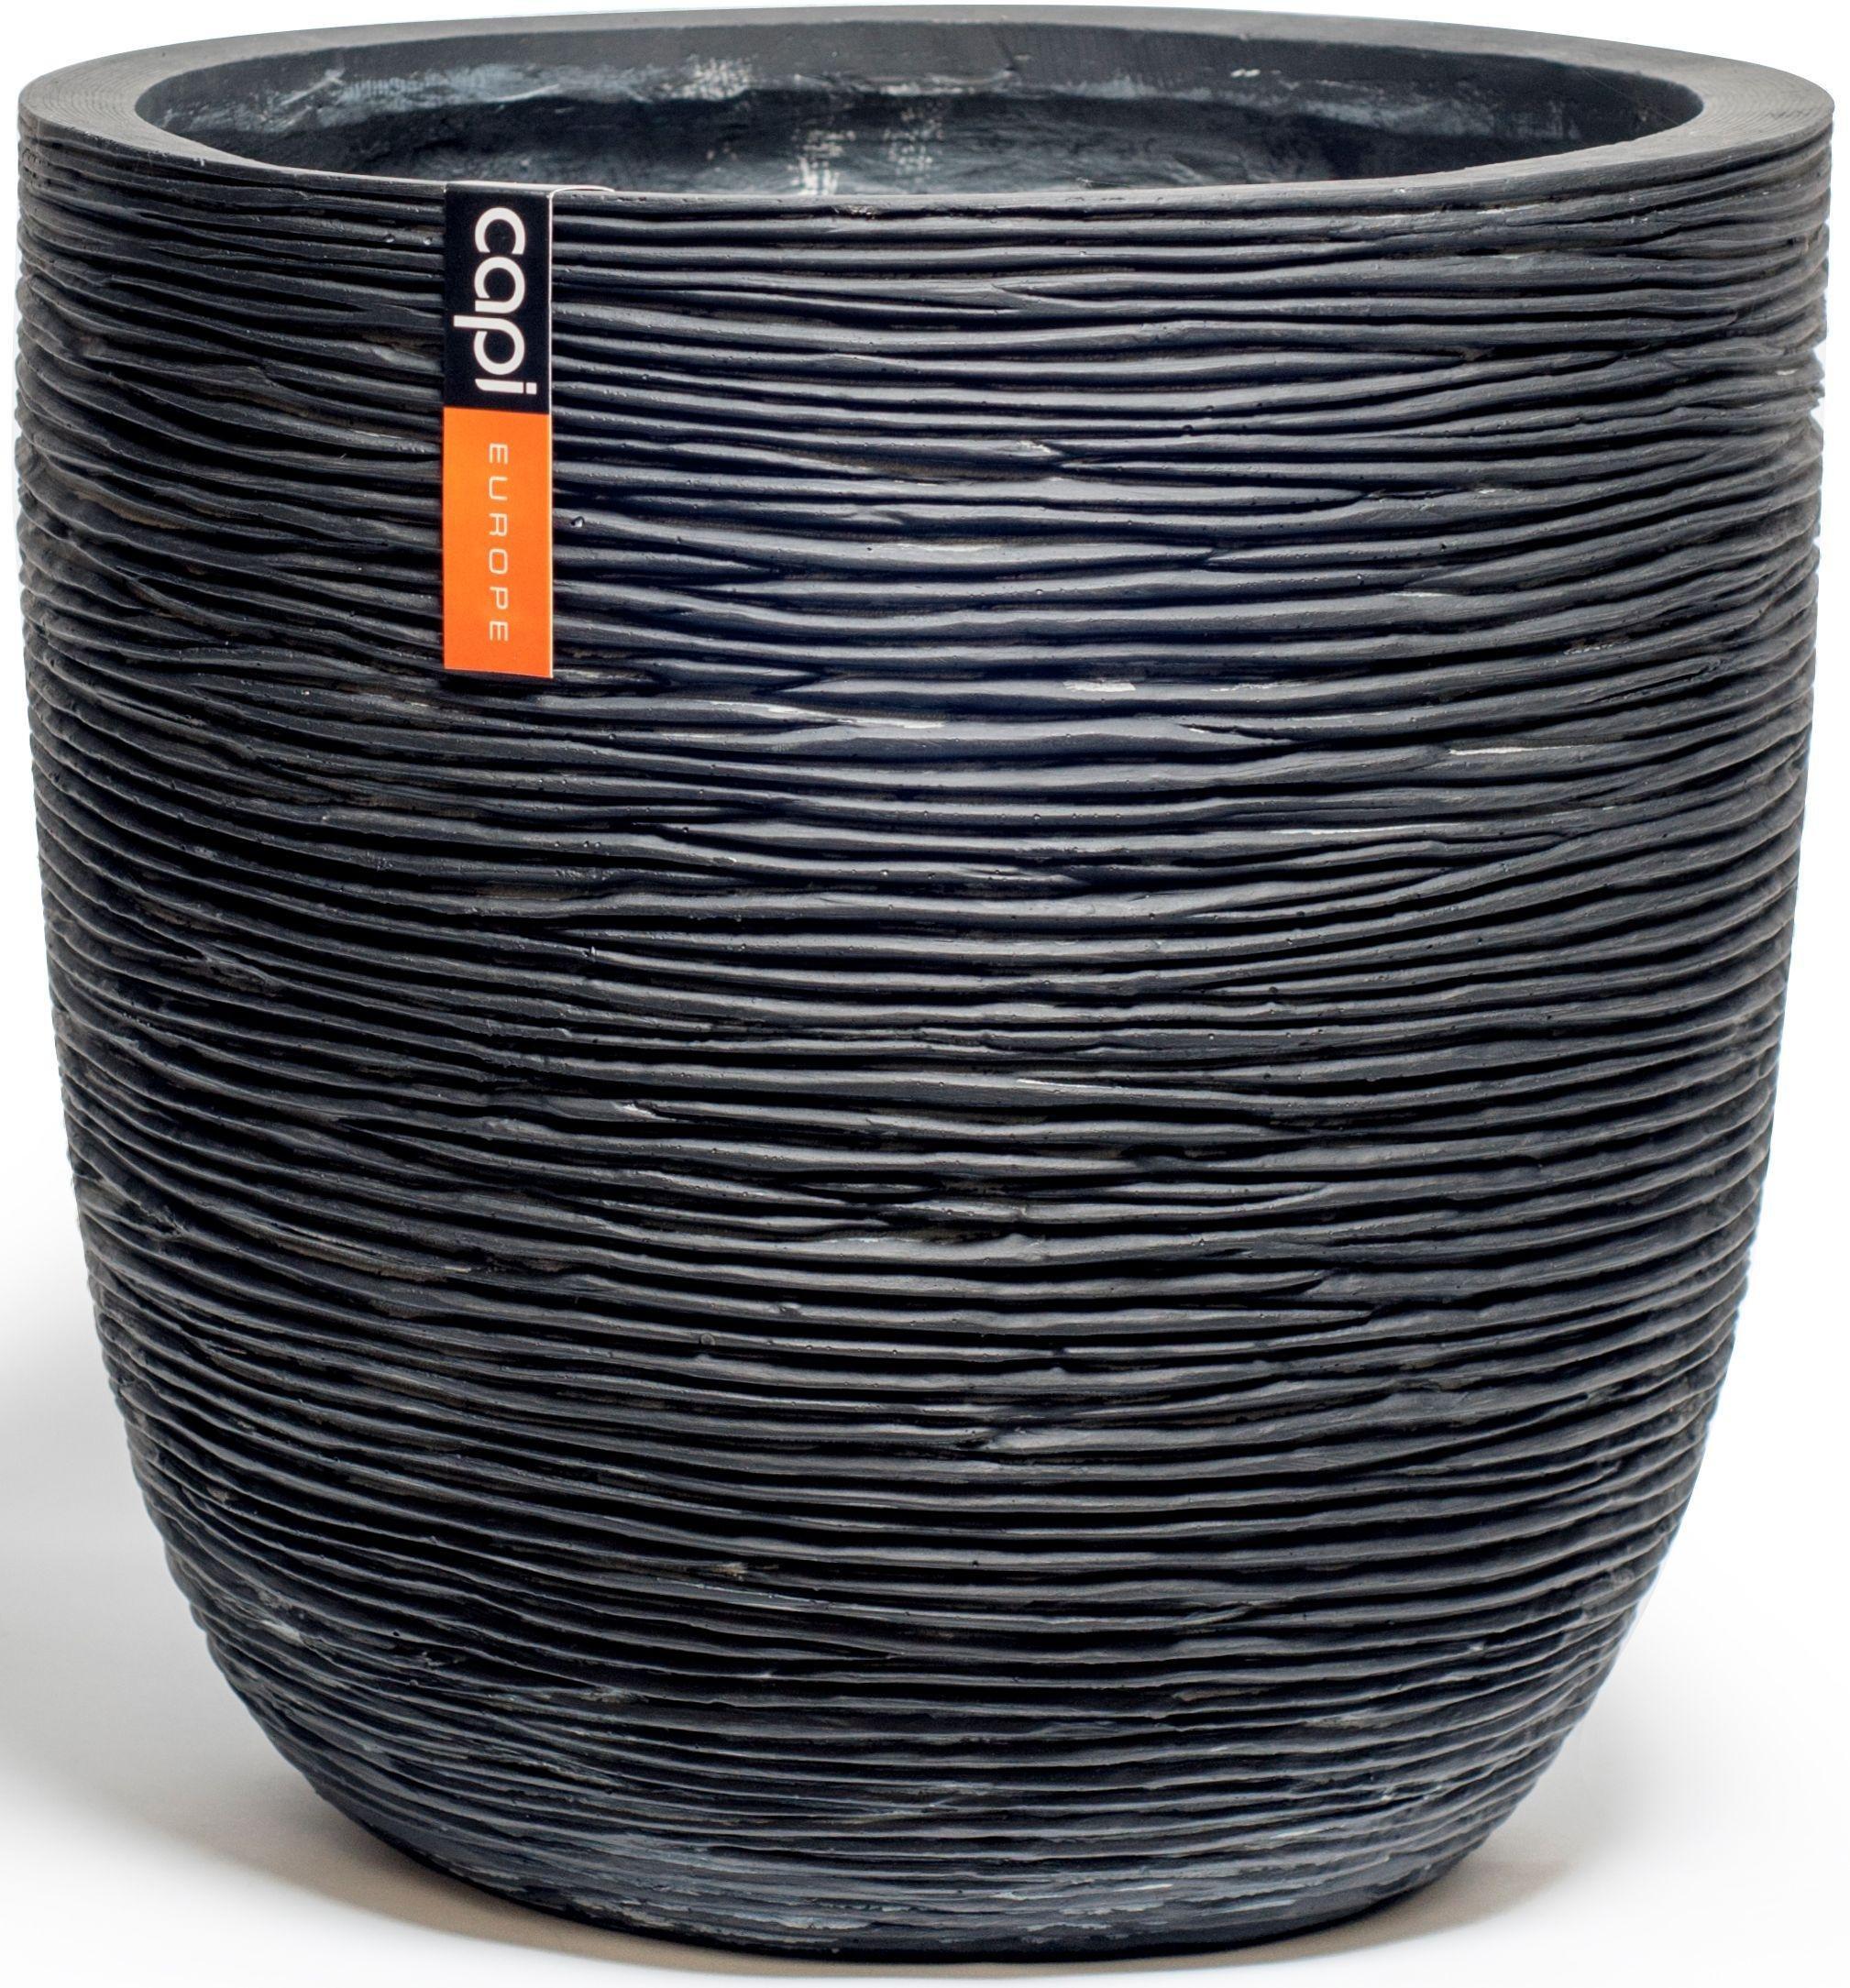 Capi Nature Black Ribbed Planter Egg - 34 x 34cm. lowest price